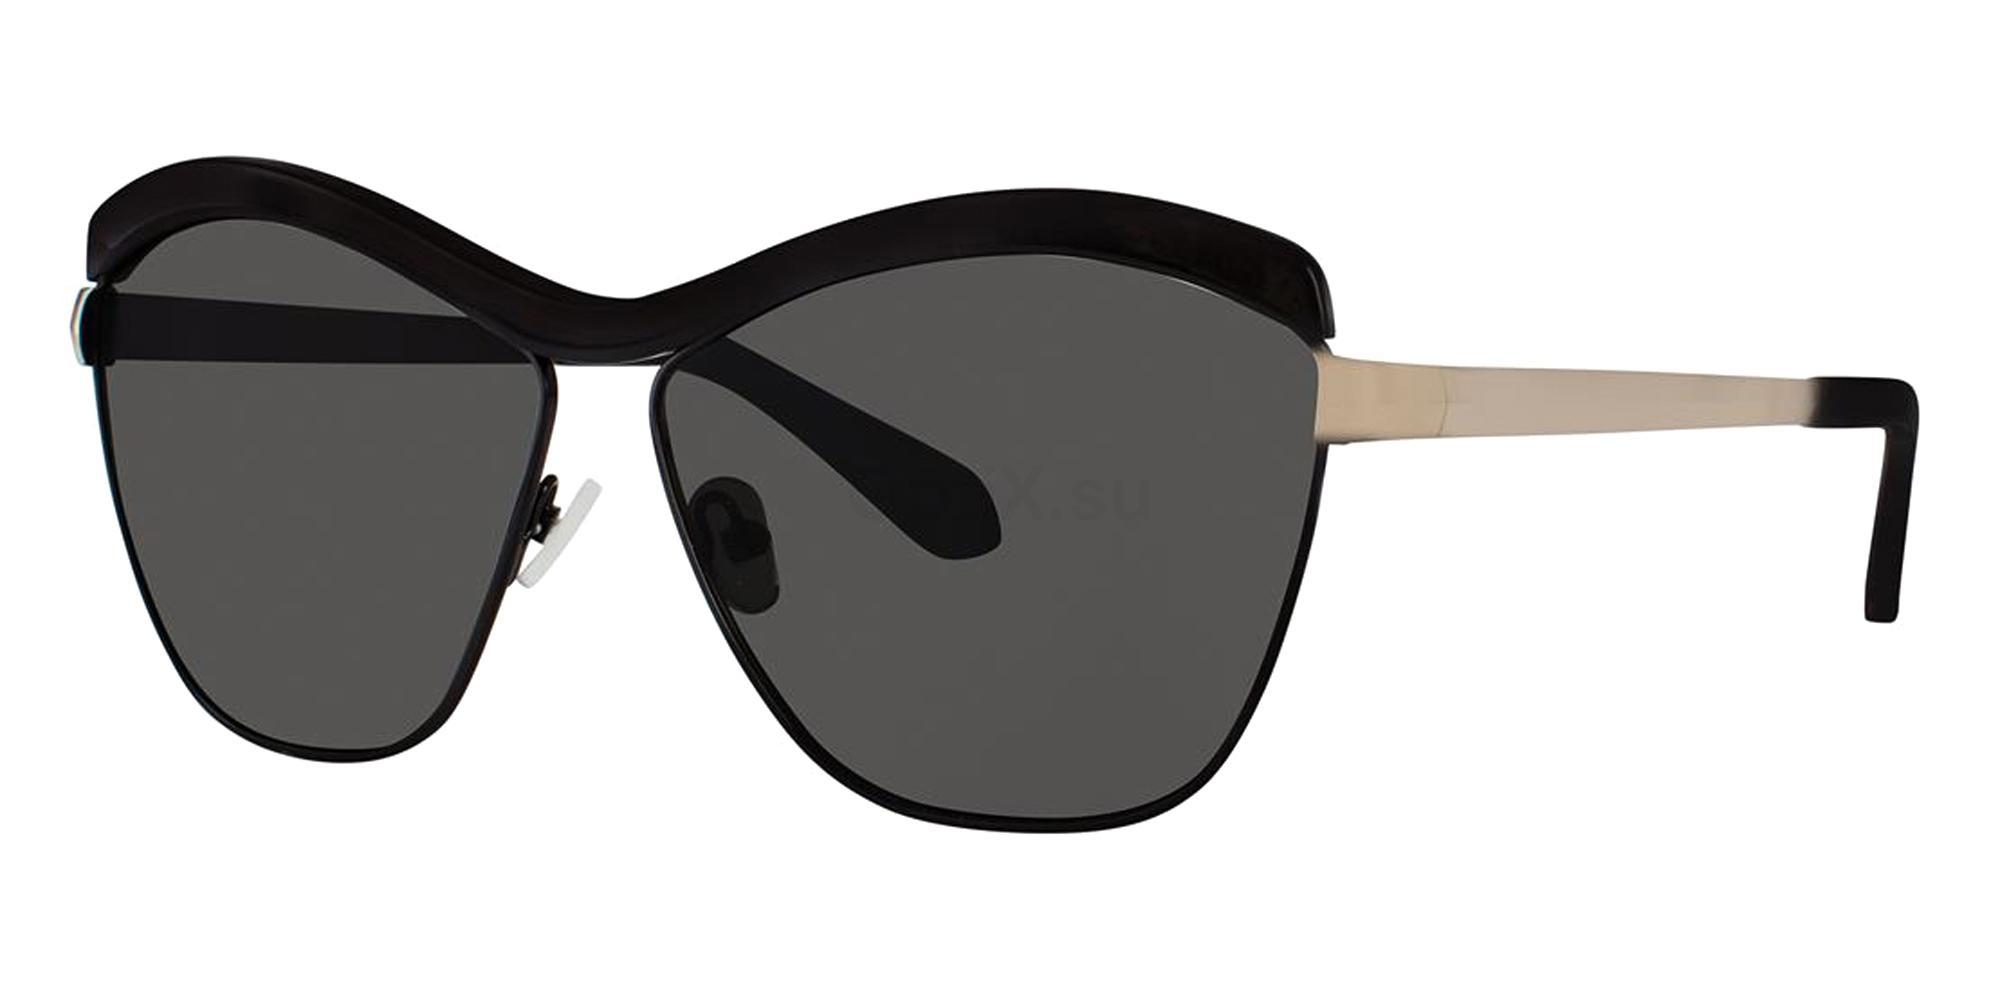 Black LUCIANA Sunglasses, Zac Posen